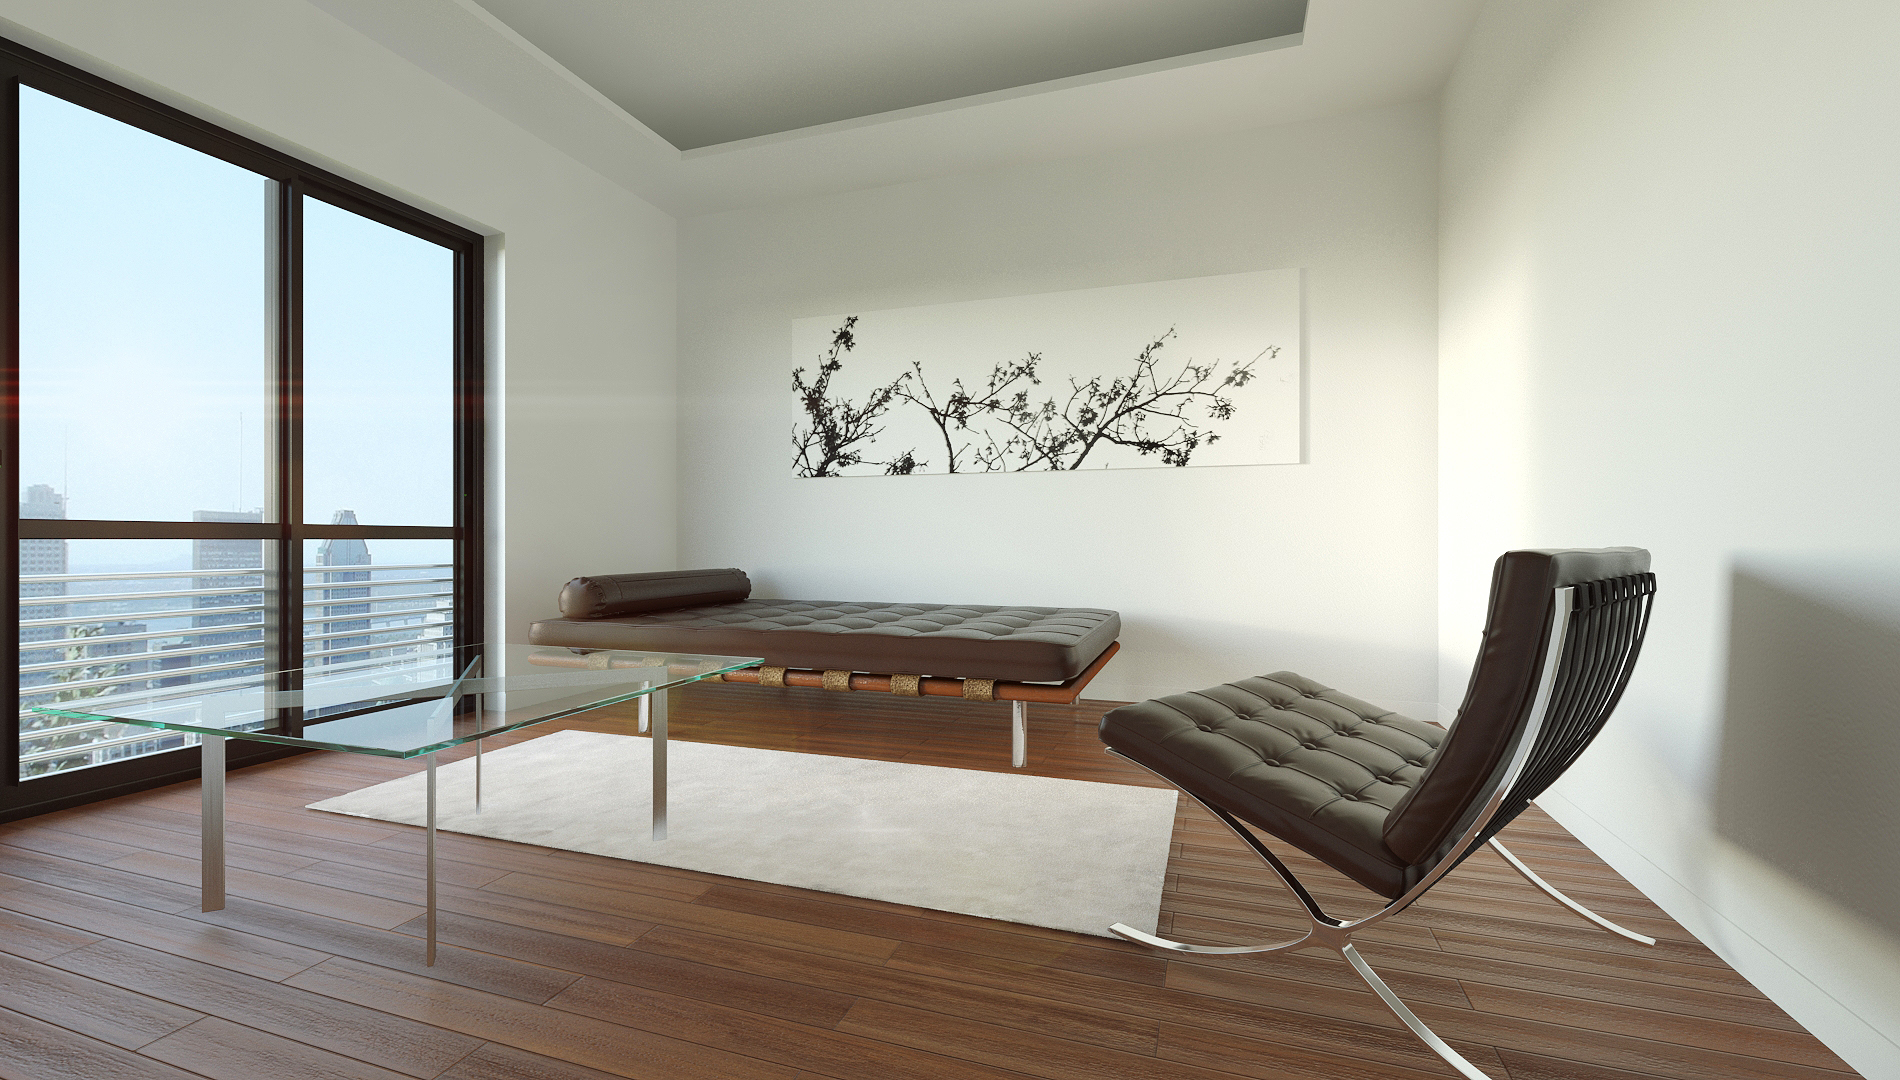 Vray interior scene w barcelona set by visuarch 3docean for Vray interior scene